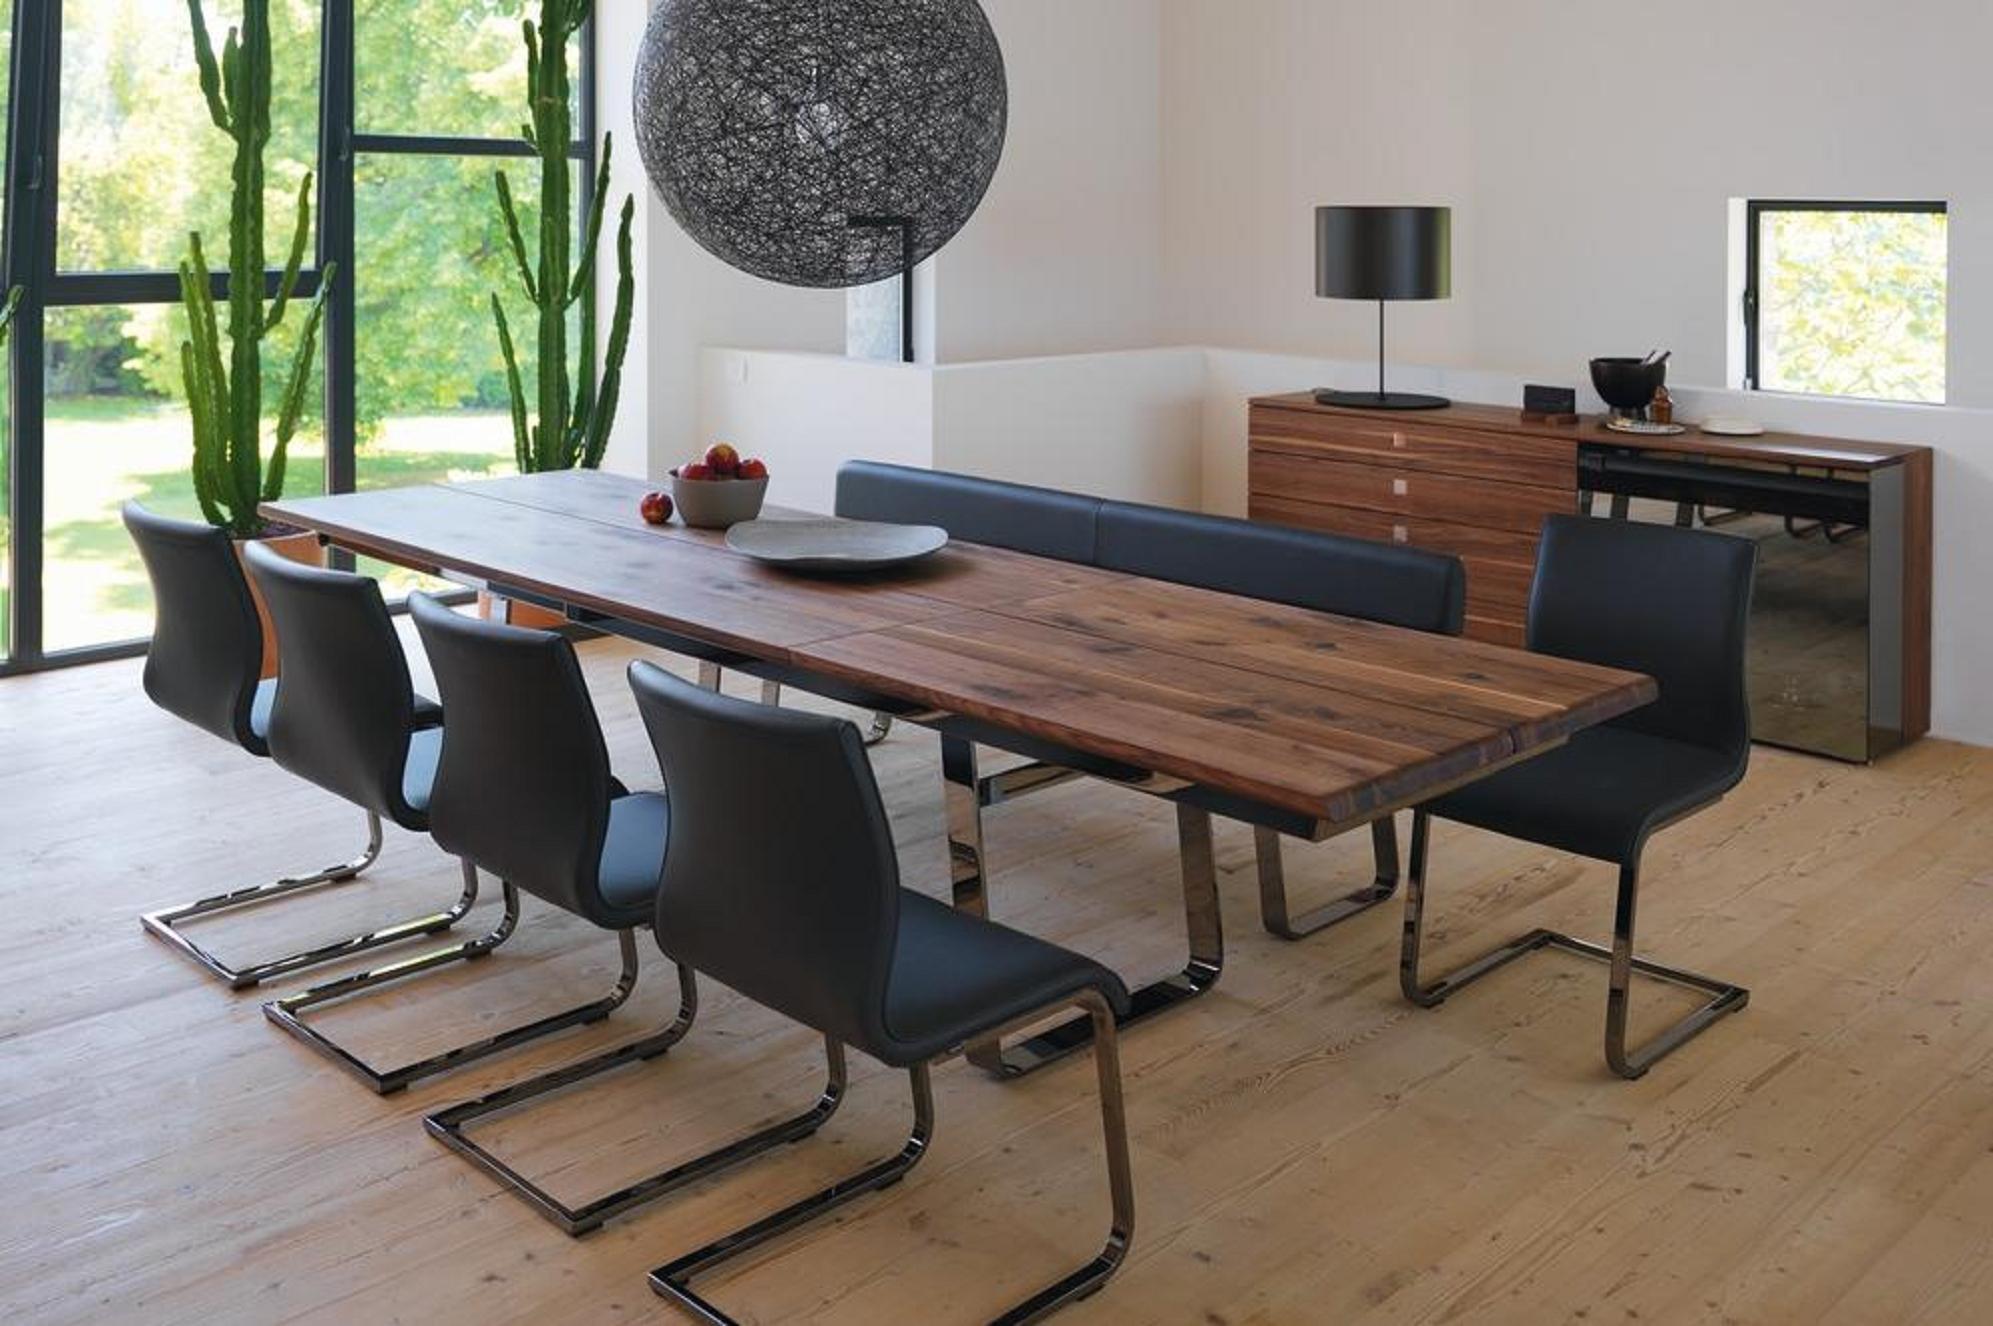 nox Tisch | Um 60 oder 120 cm verlängerbar | TEAM 7